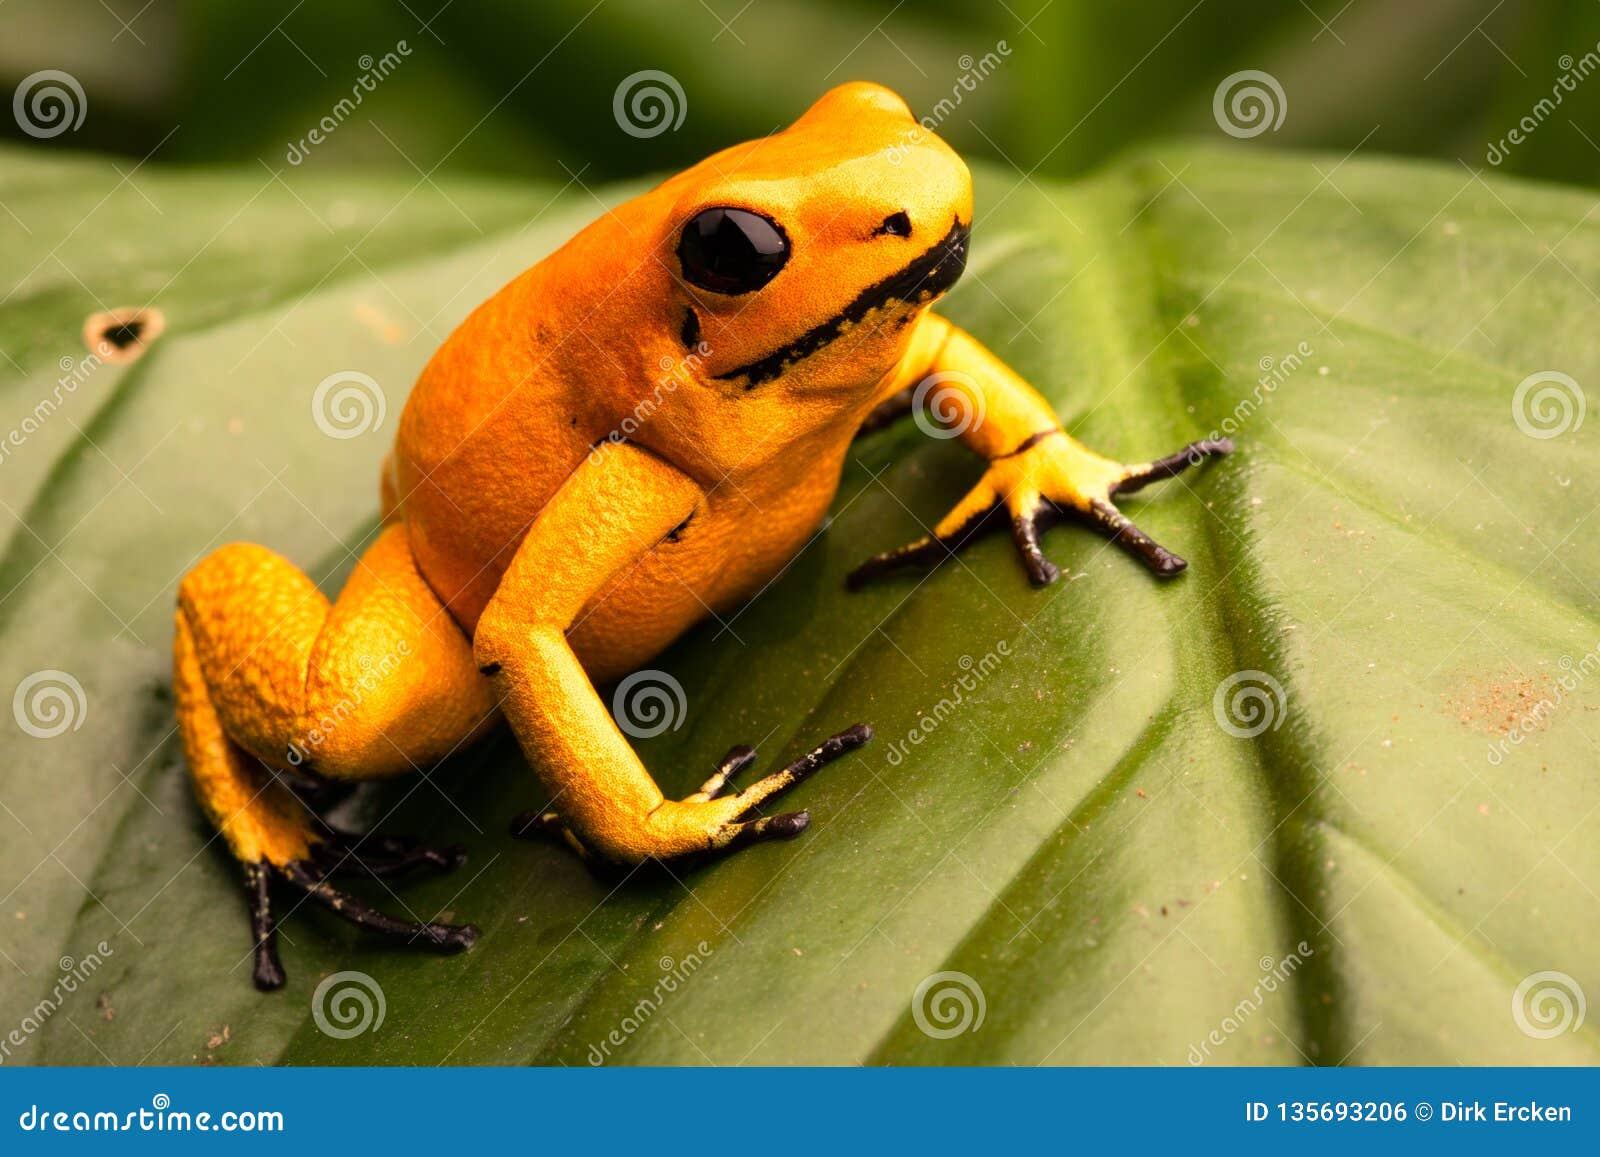 Poison dart frog Phyllobates terribilis orange